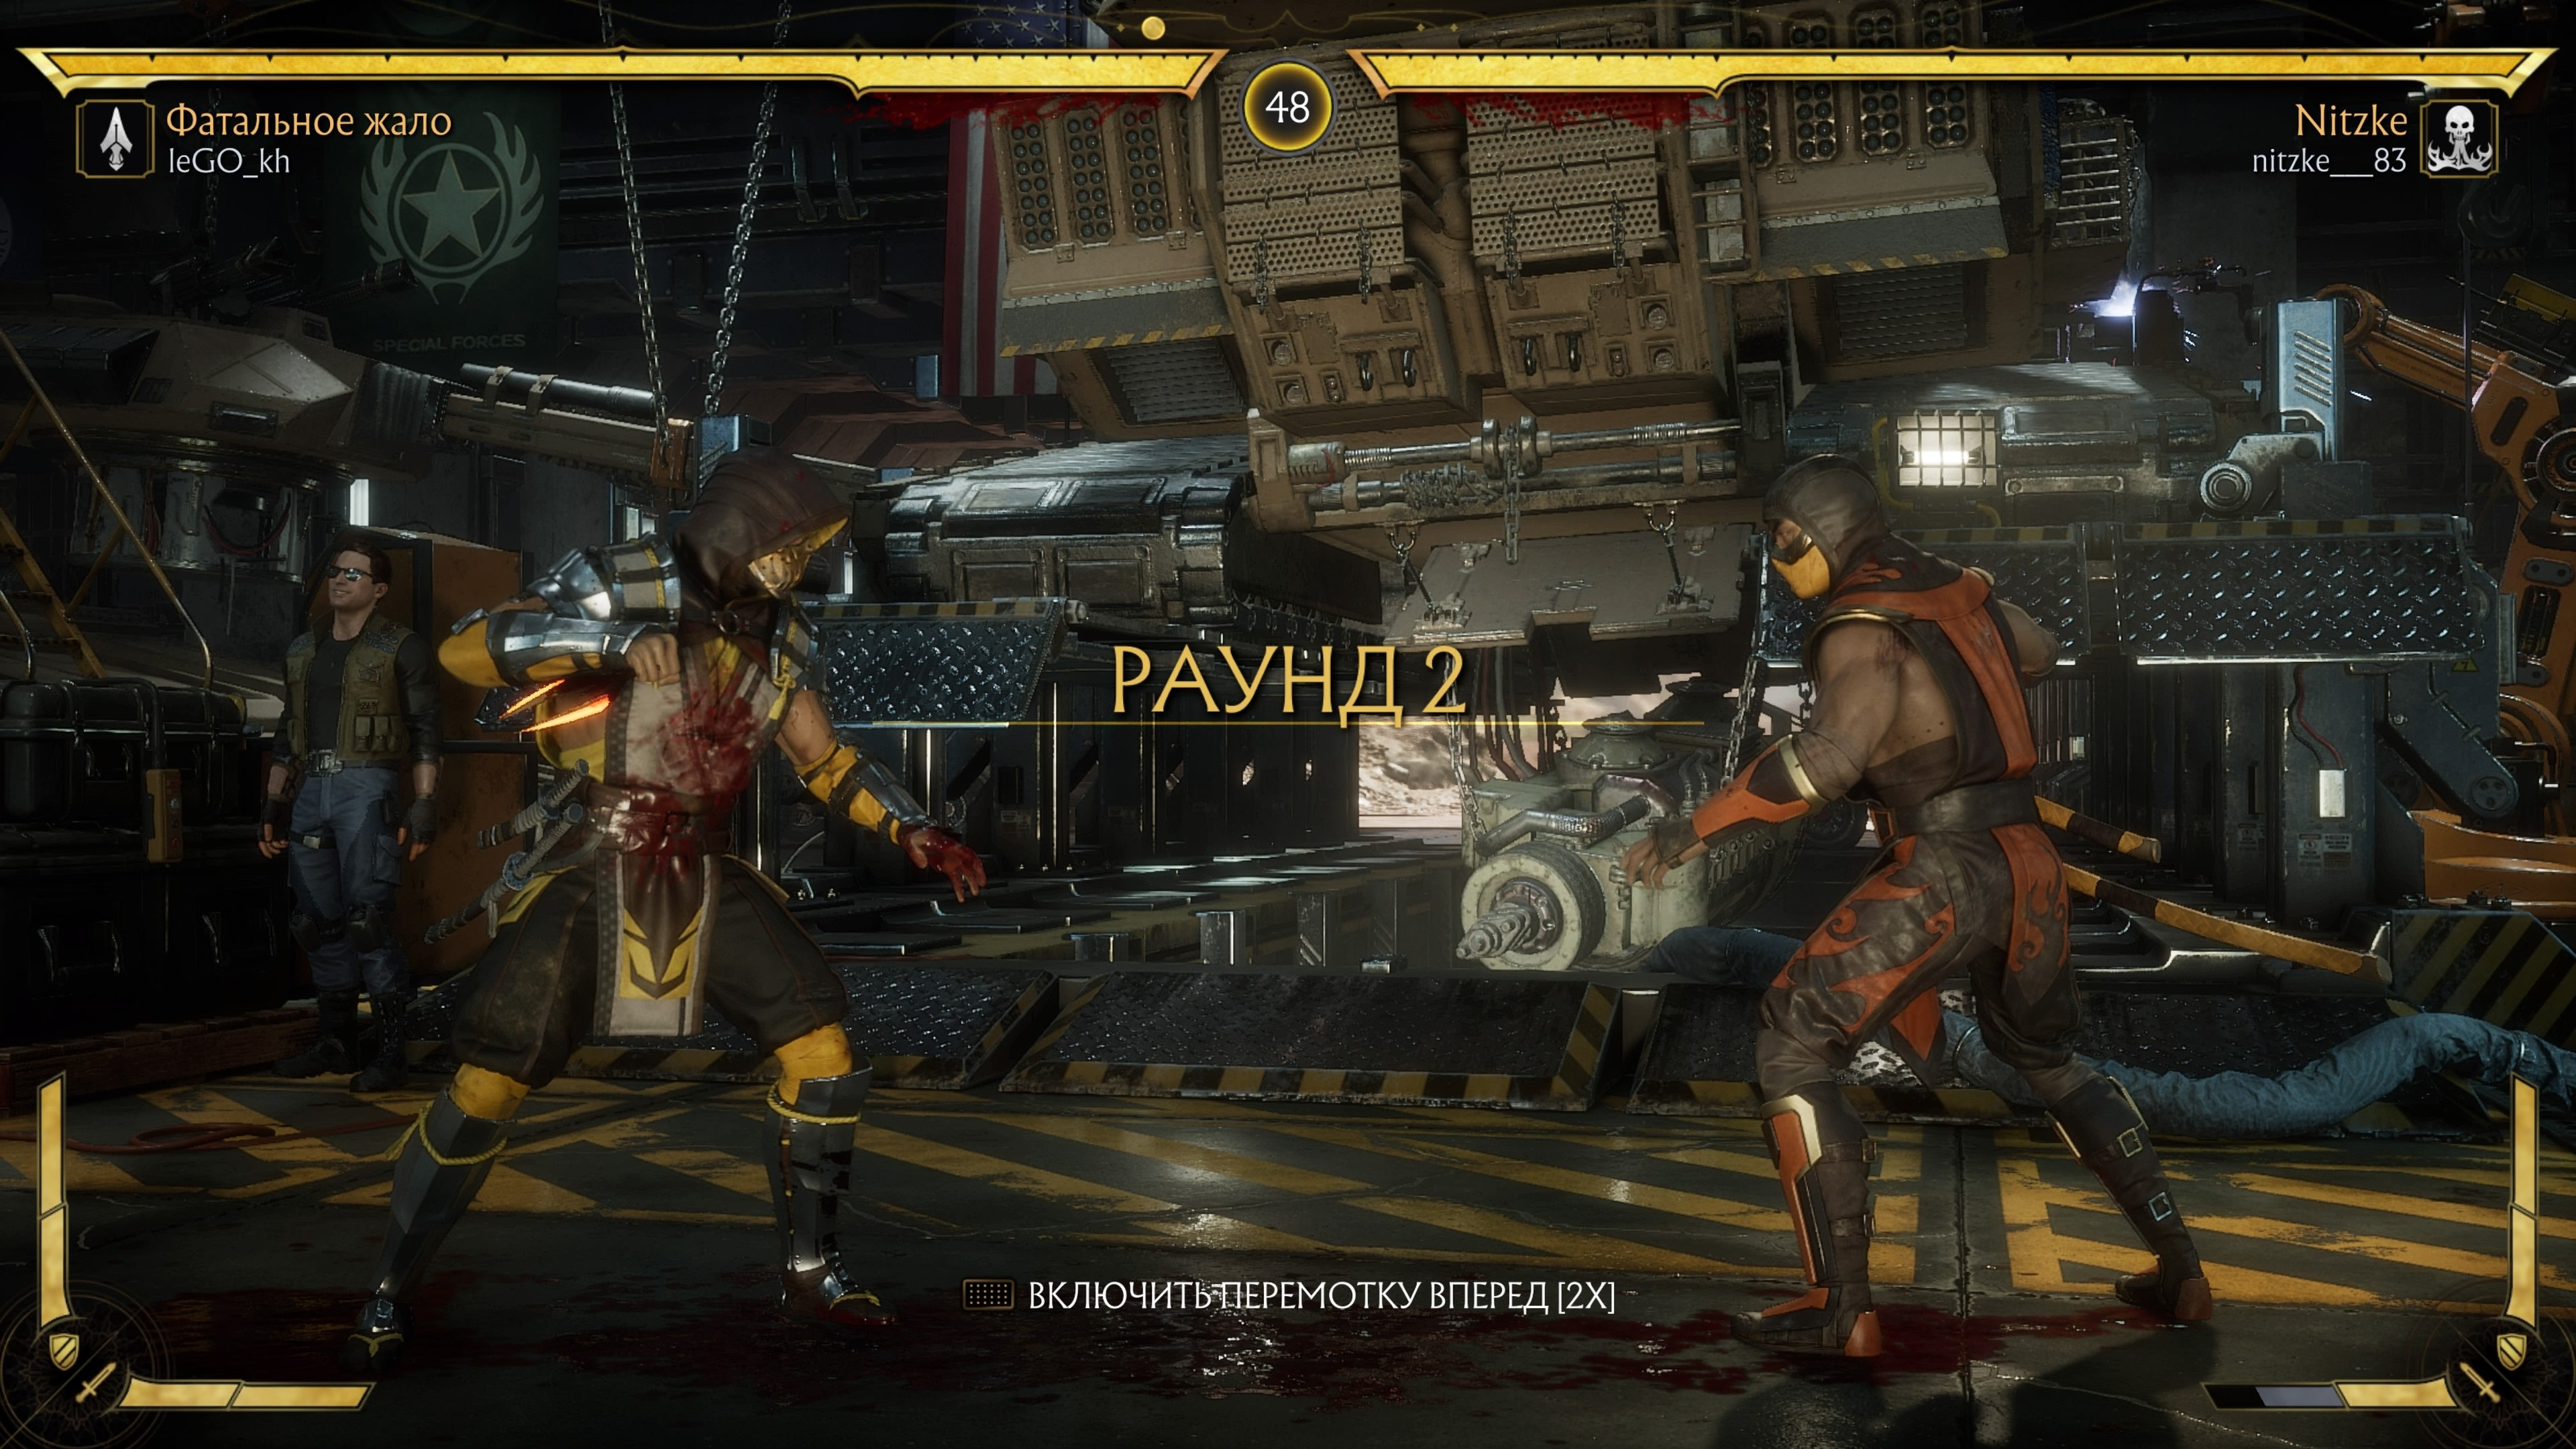 Screenshot for the game Mortal Kombat 11 Premium Edition [Steam-Rip] (2019) download torrent License